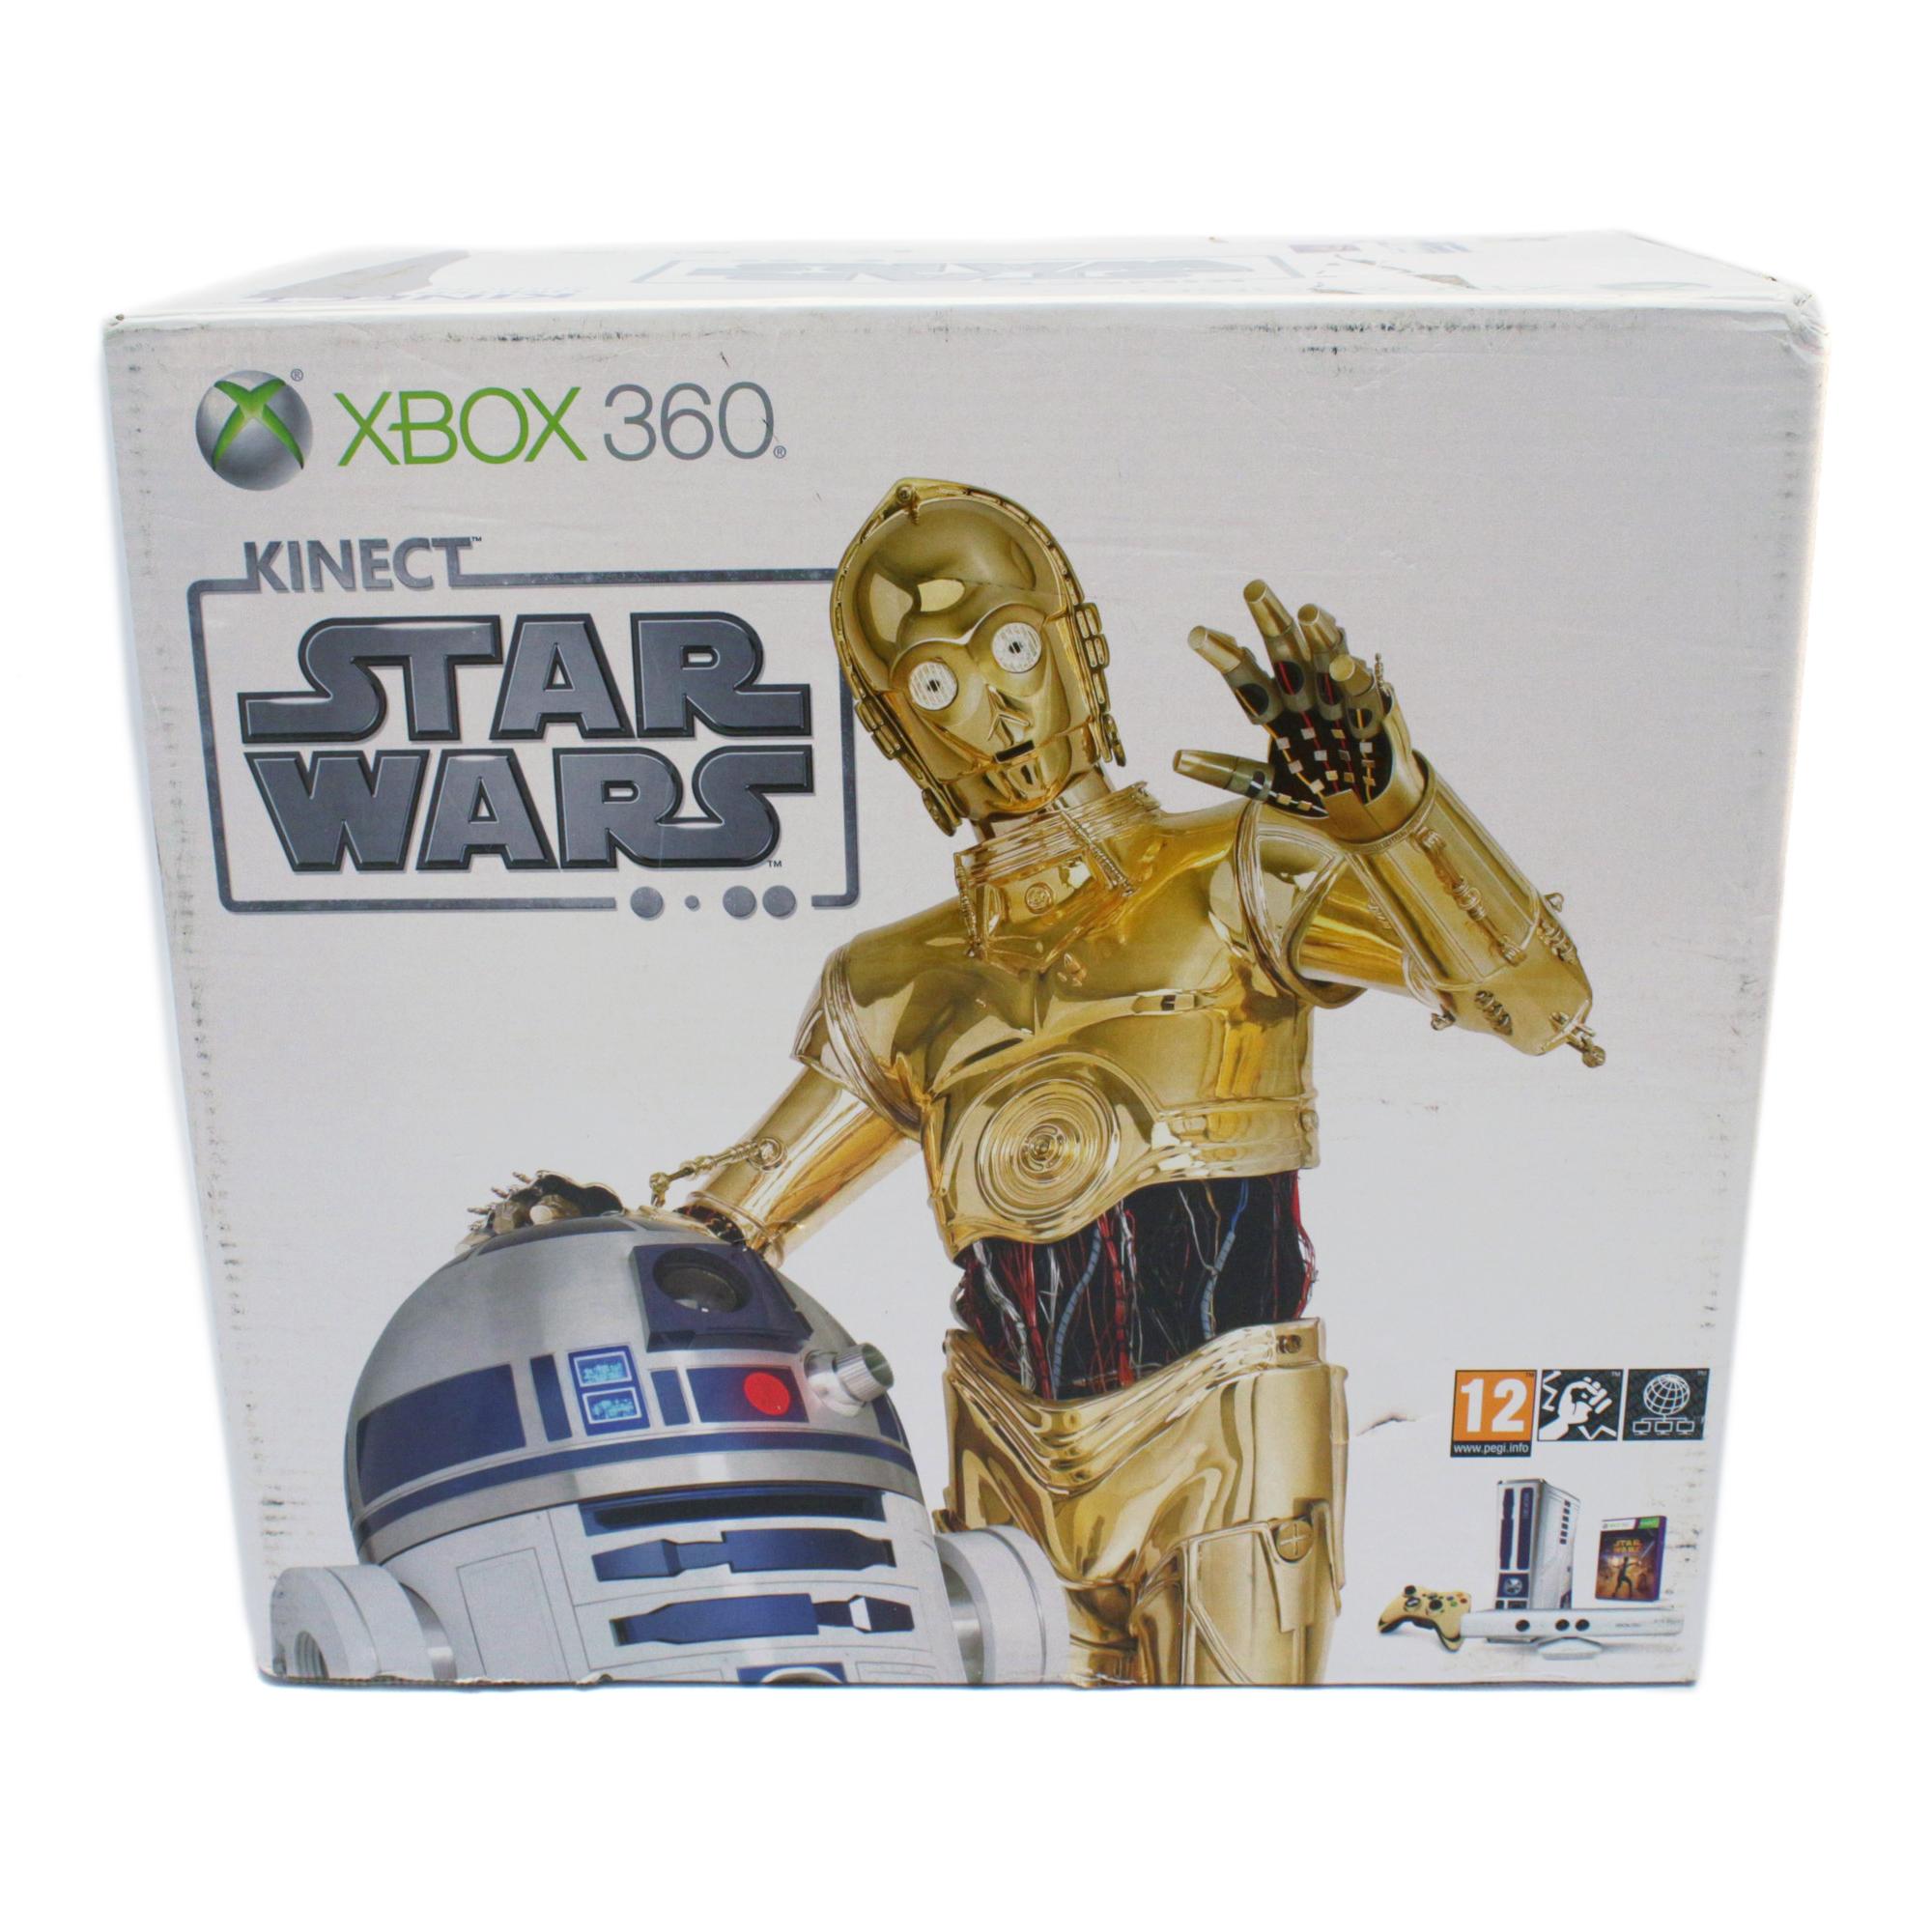 SA 143: Konsole Slim 320GB #Star Wars Edition UNVOLLSTÄNDIG